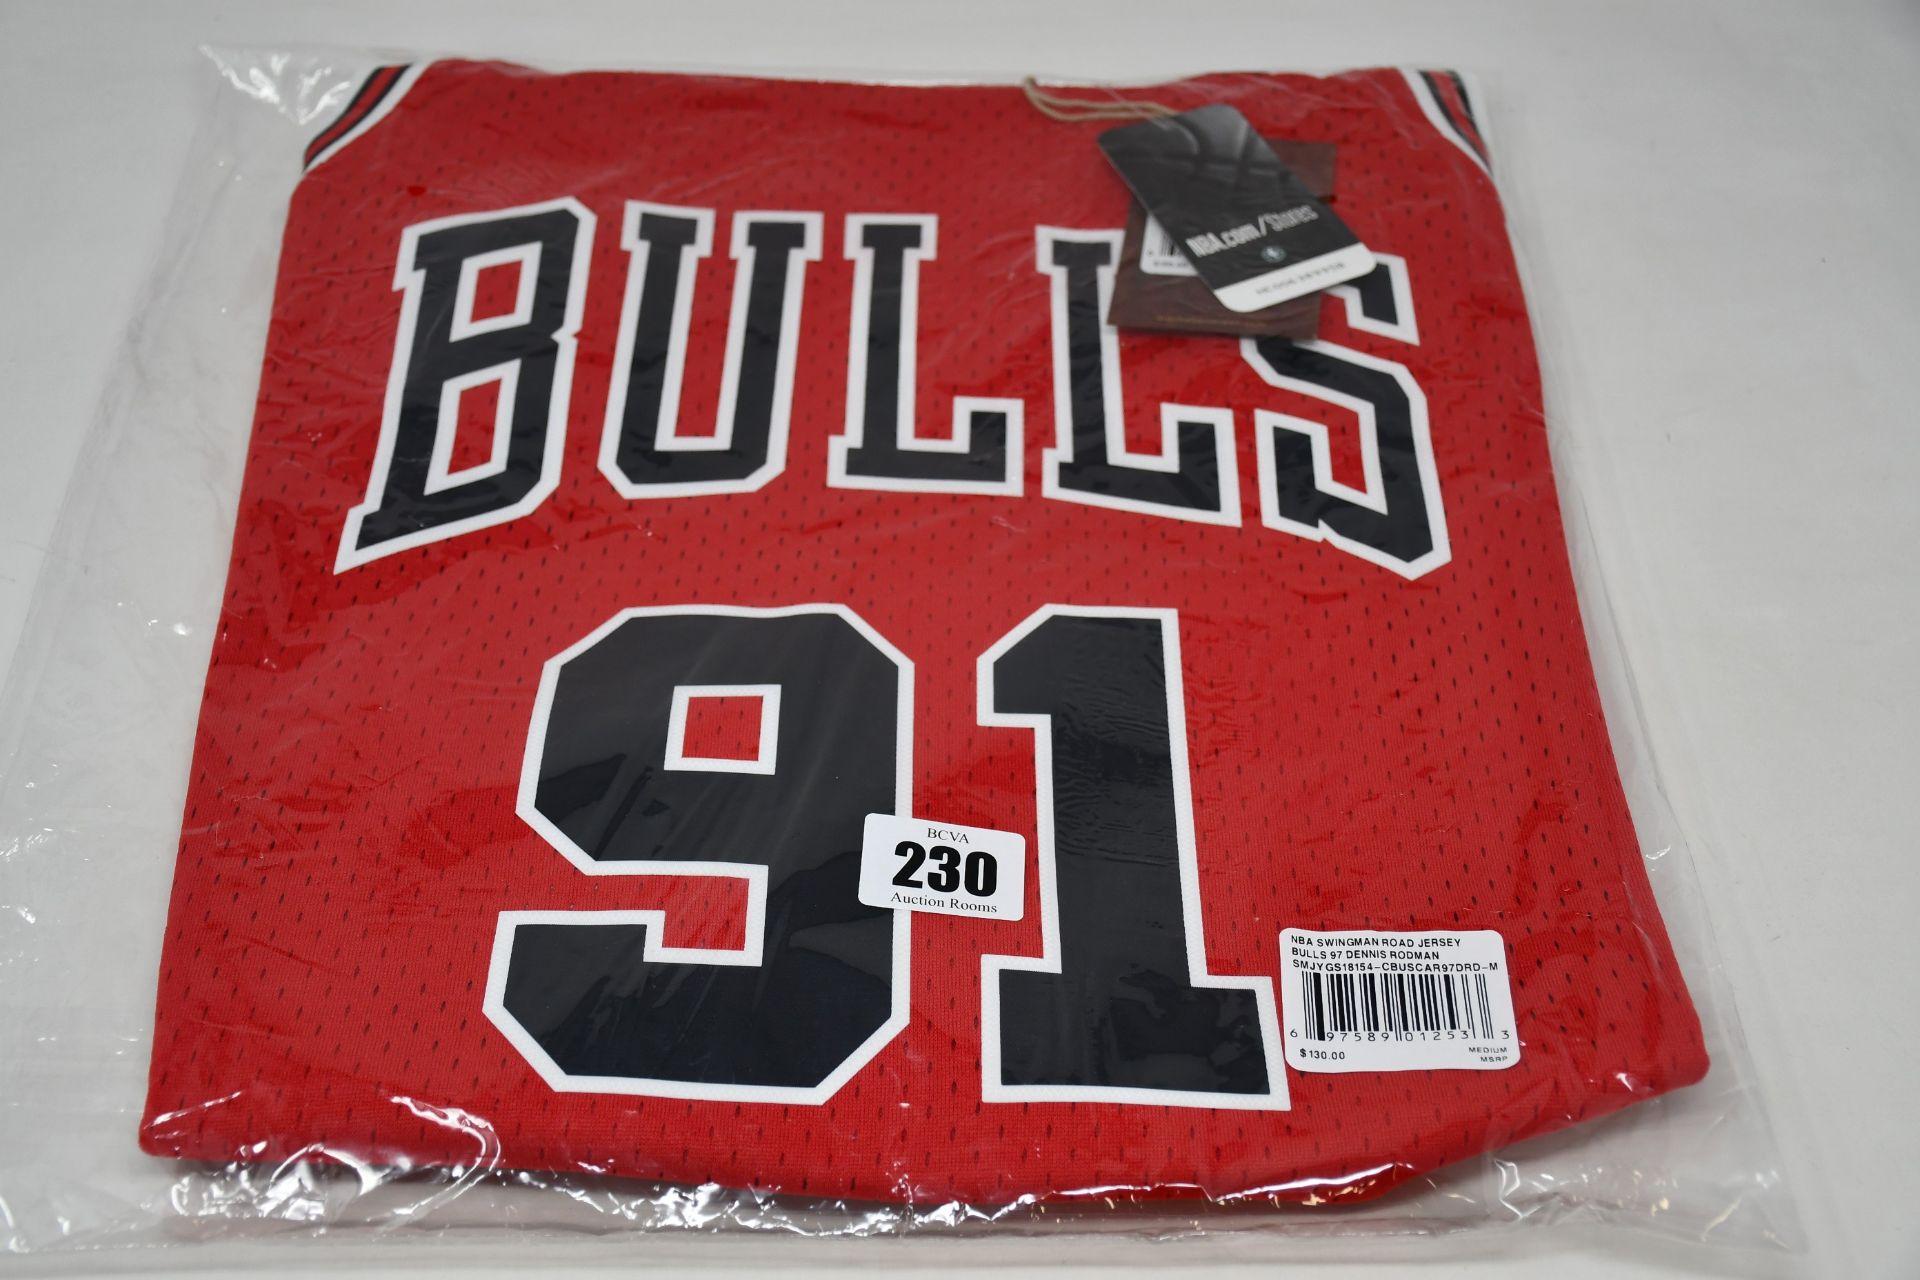 An as new Mitchell & Ness replica NBA Swingman Road jersey Bulls 97 Dennis Rodman (M - RRP $130).